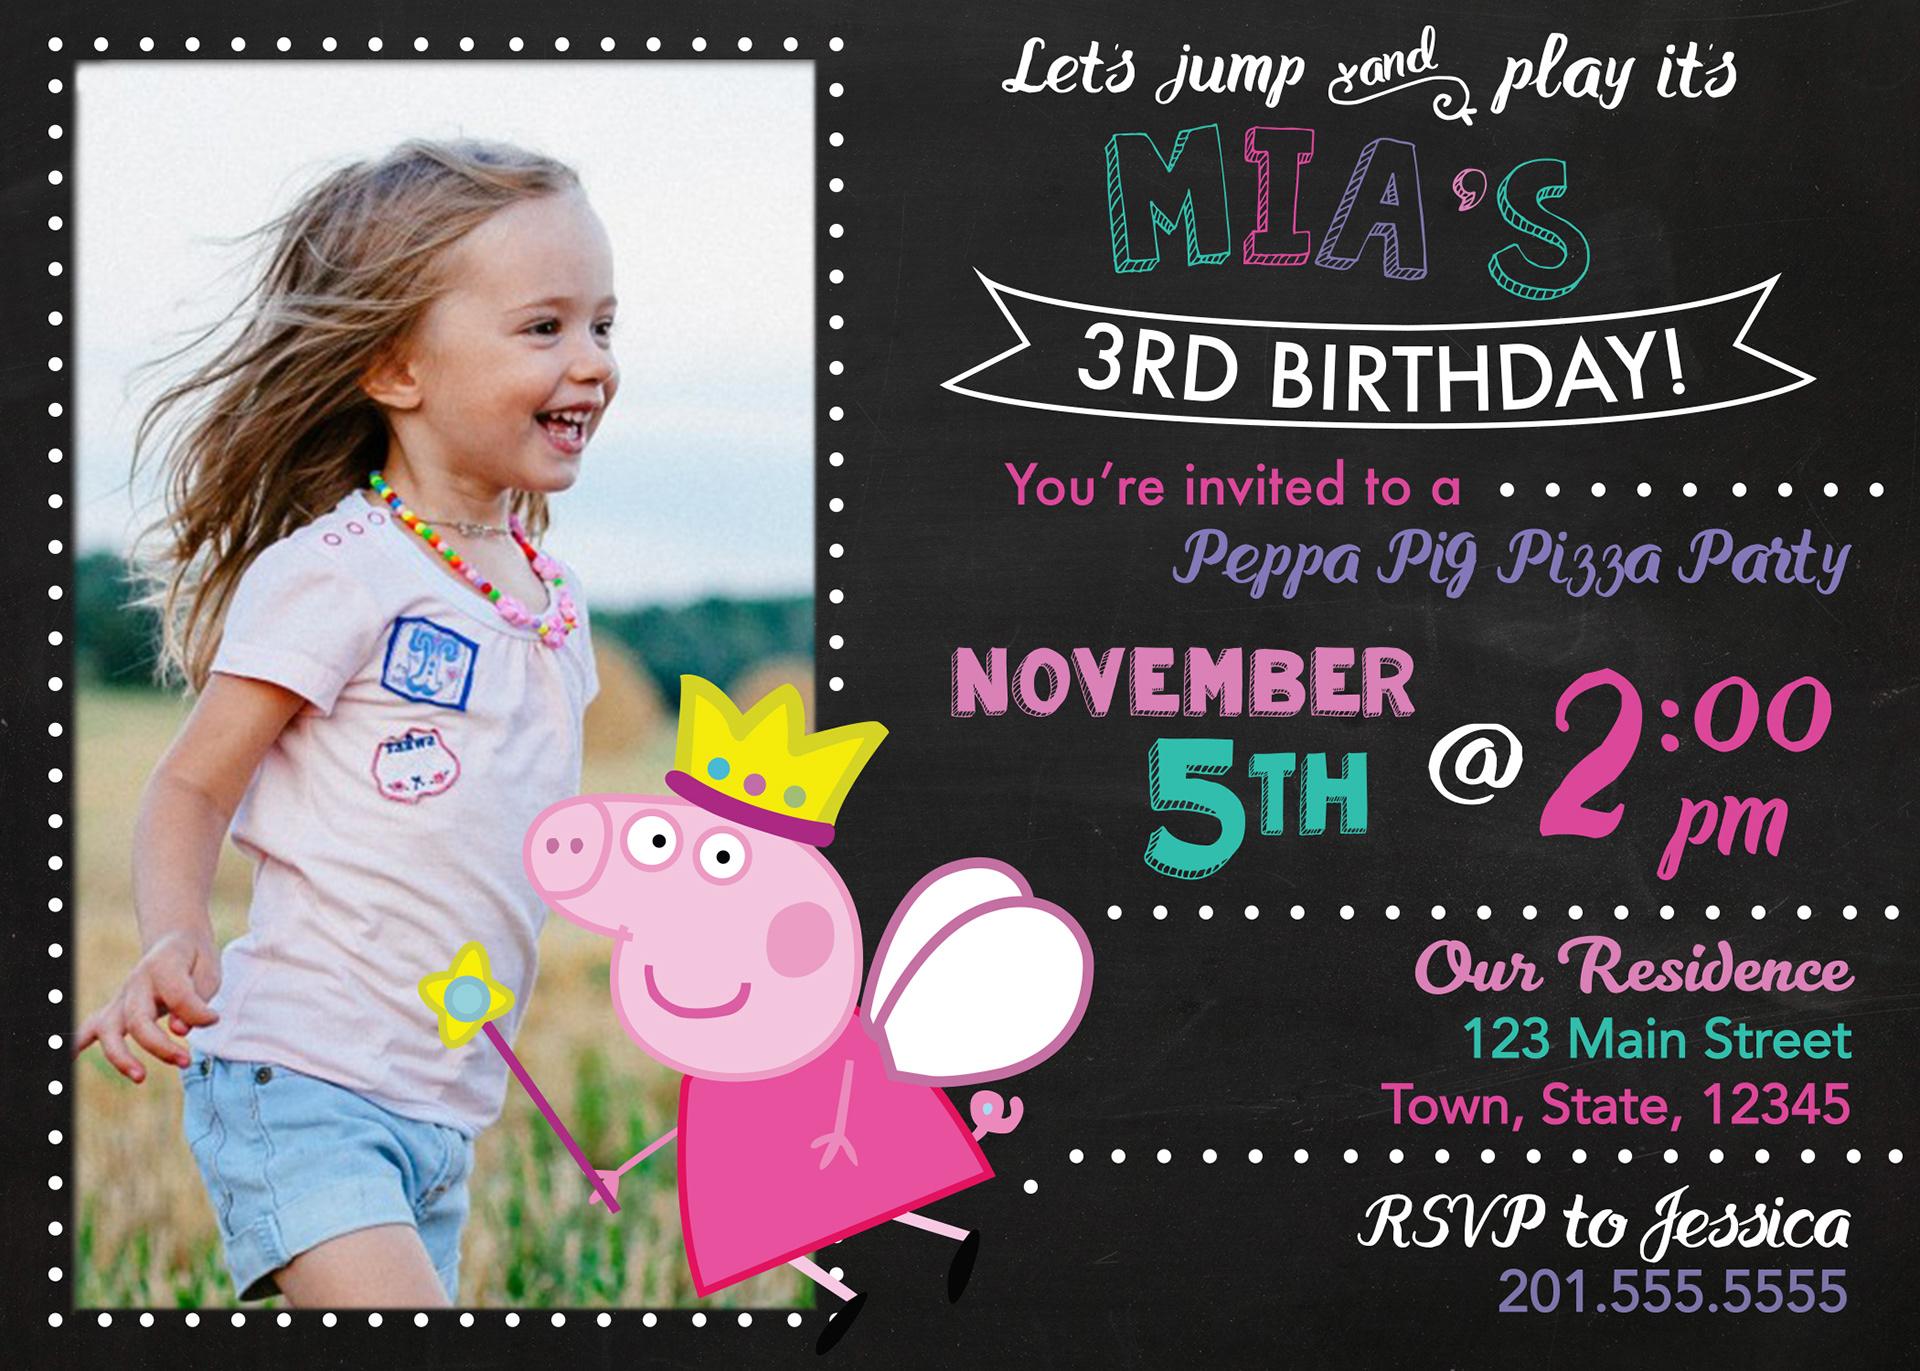 3rd birthday invitation on behance